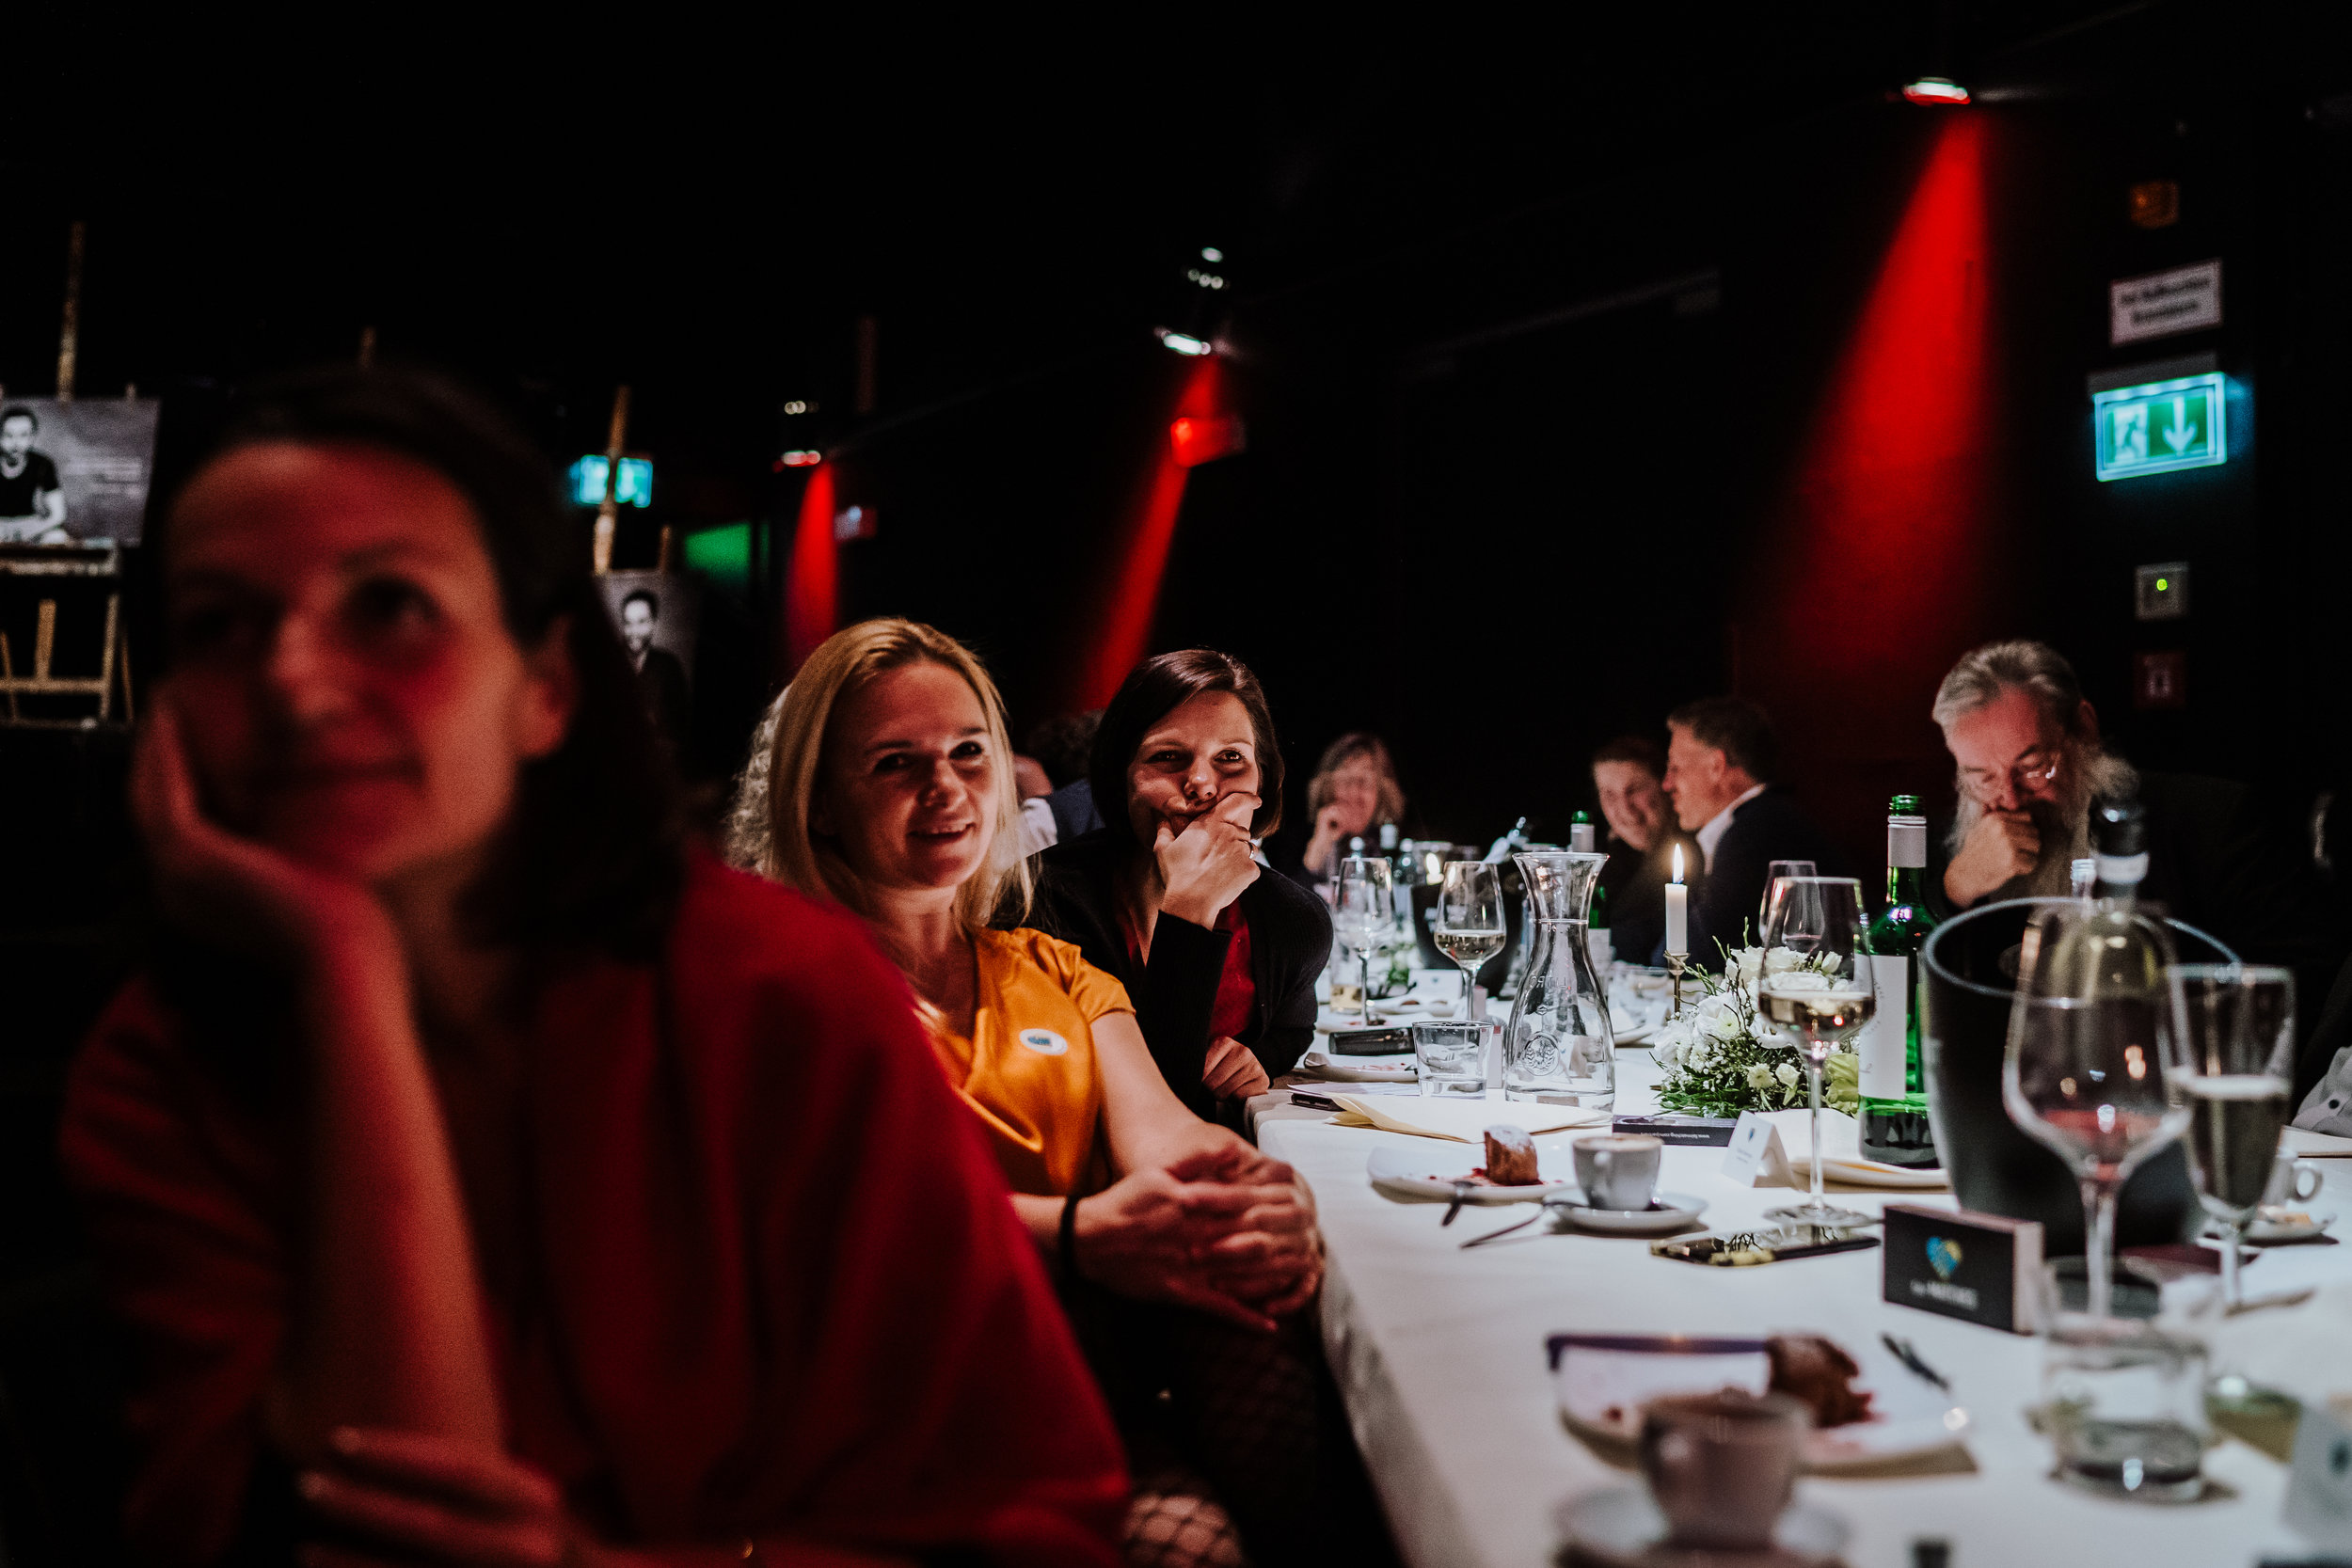 derPasquali-Fairmatching Gala Abend-01883.jpg